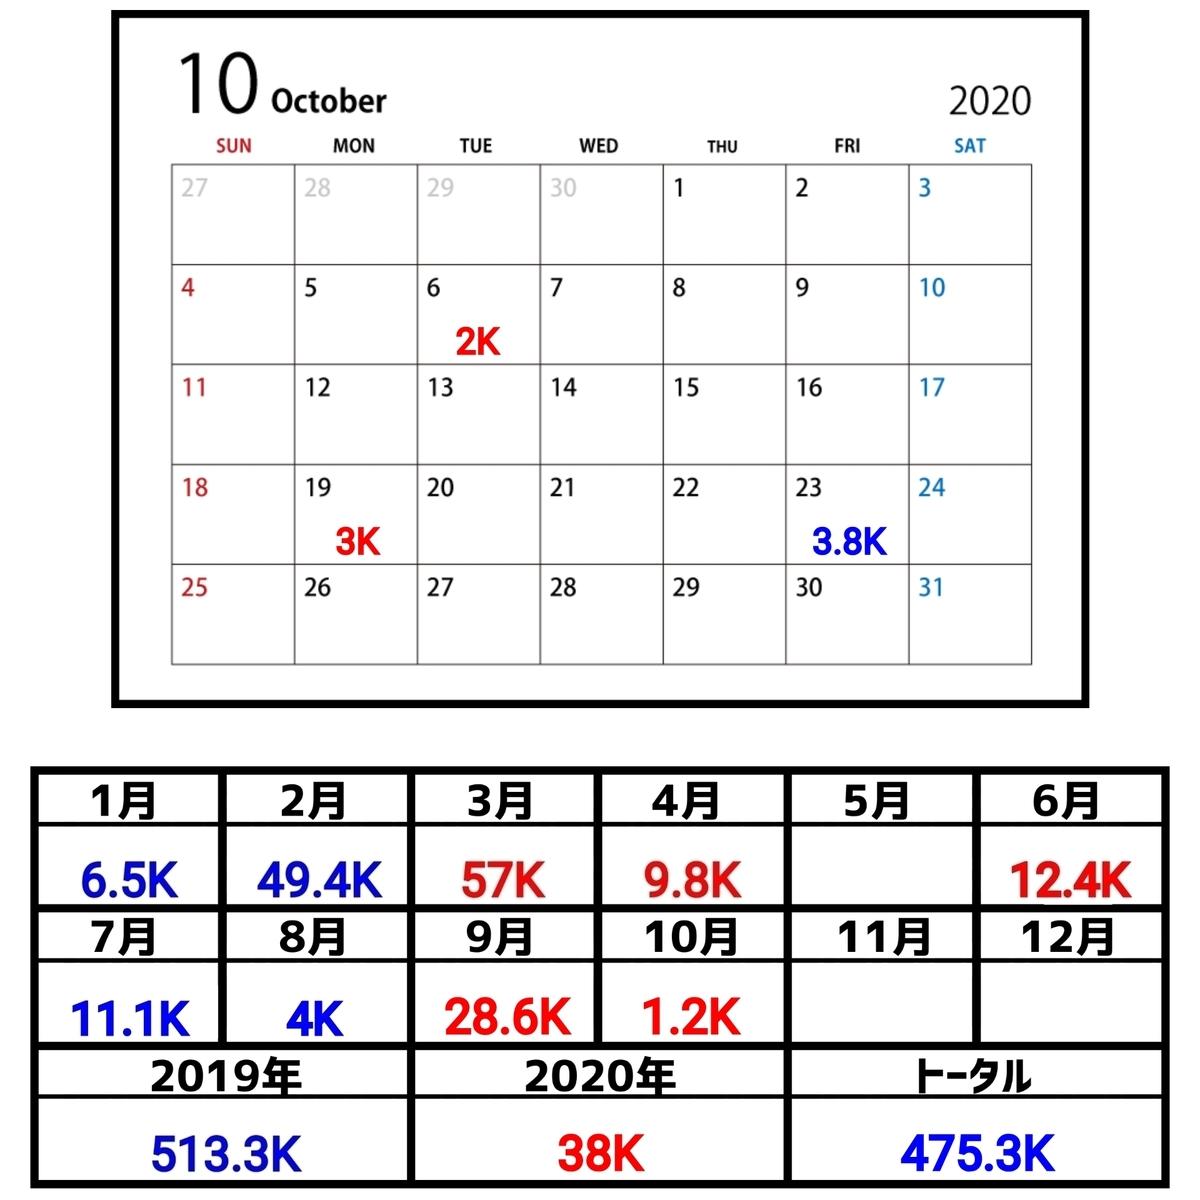 f:id:kohdyun:20201024142744j:plain